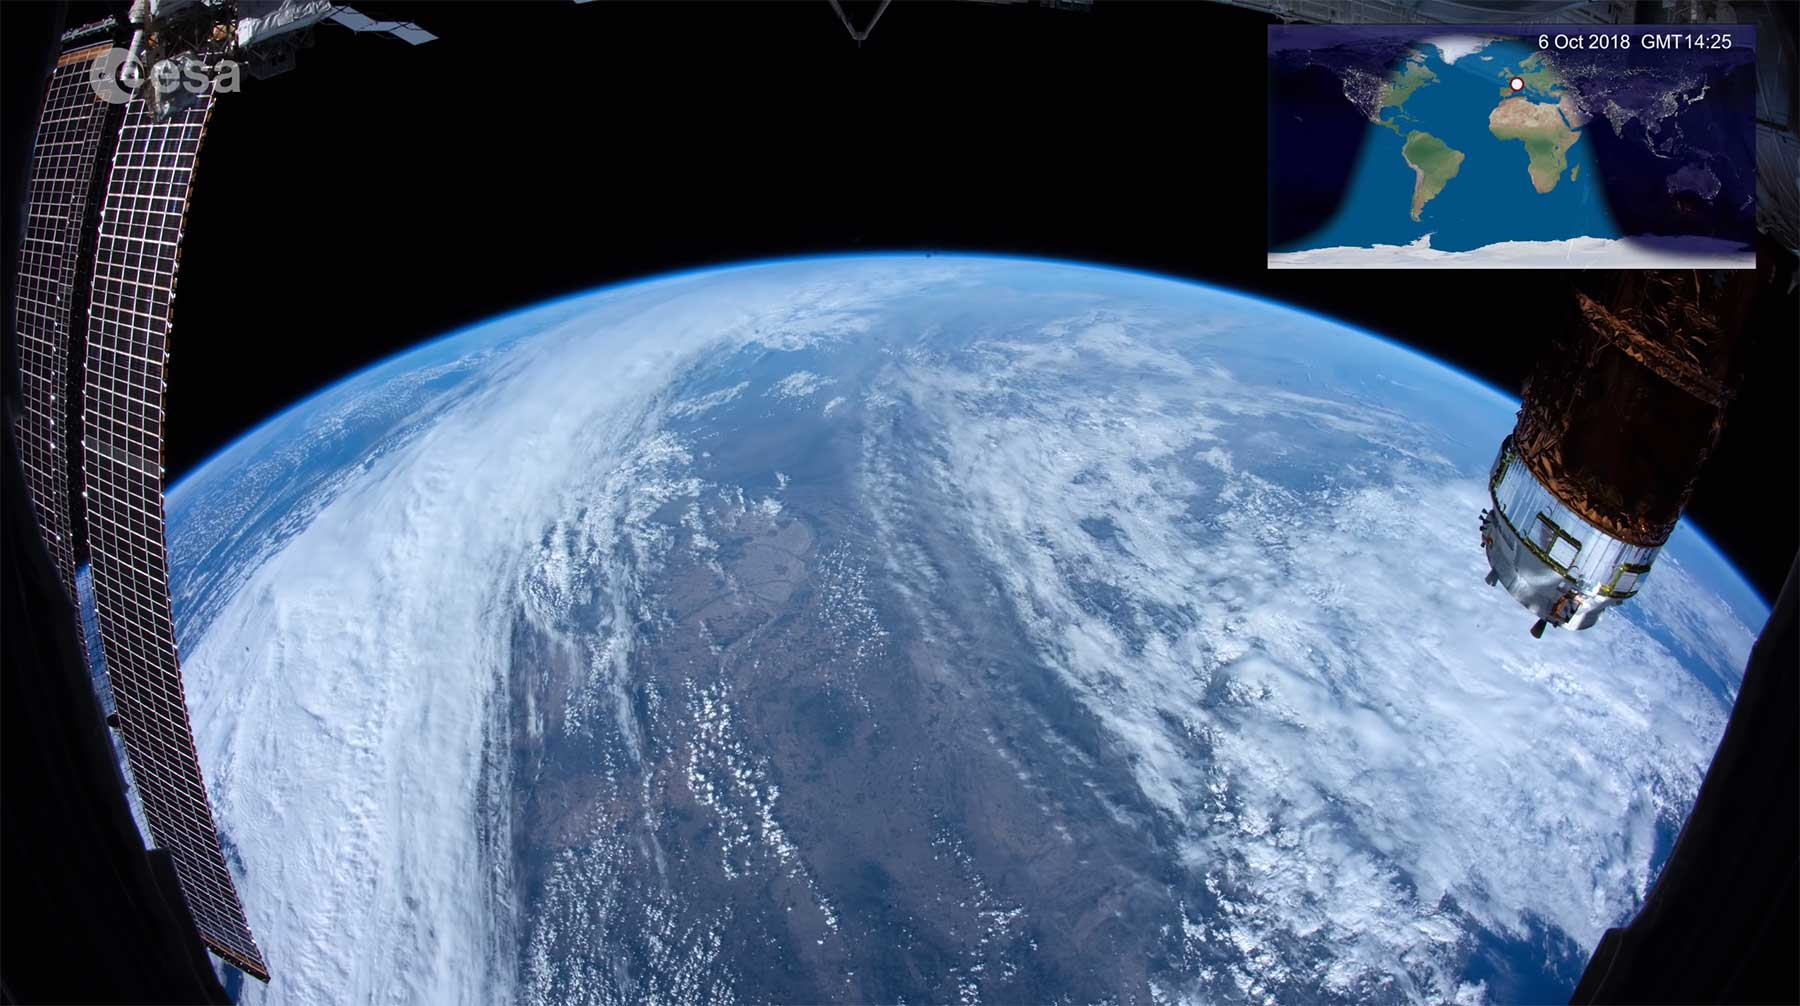 Das längste Timelapse-Video aus dem Weltall iss-weltumrundung-zeitraffer